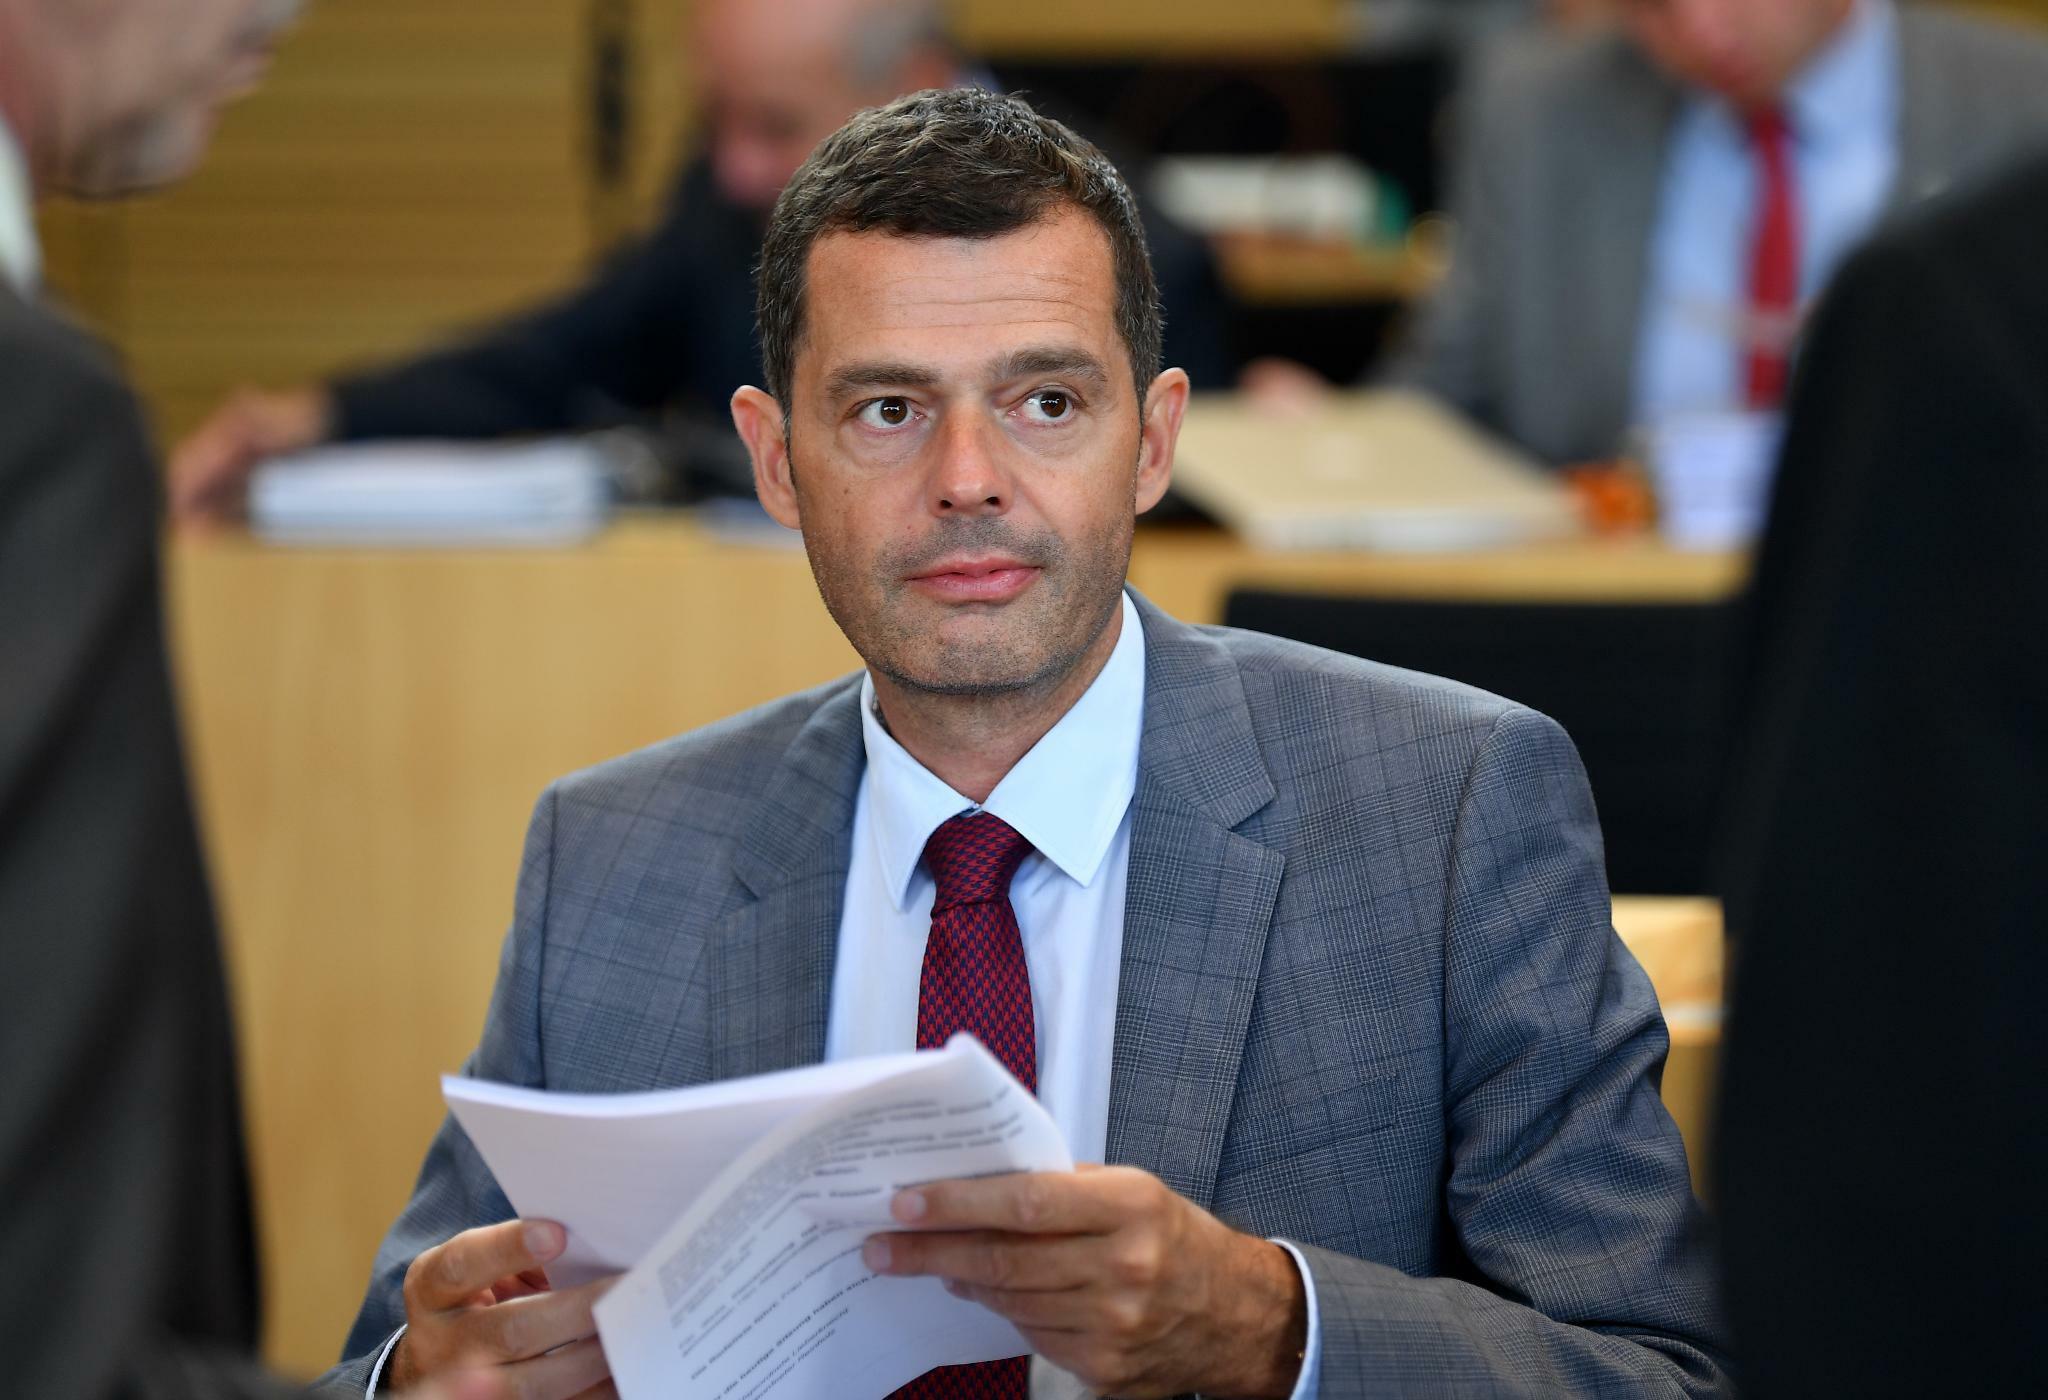 CDU-Politiker Mohring macht Morddrohung öffentlich